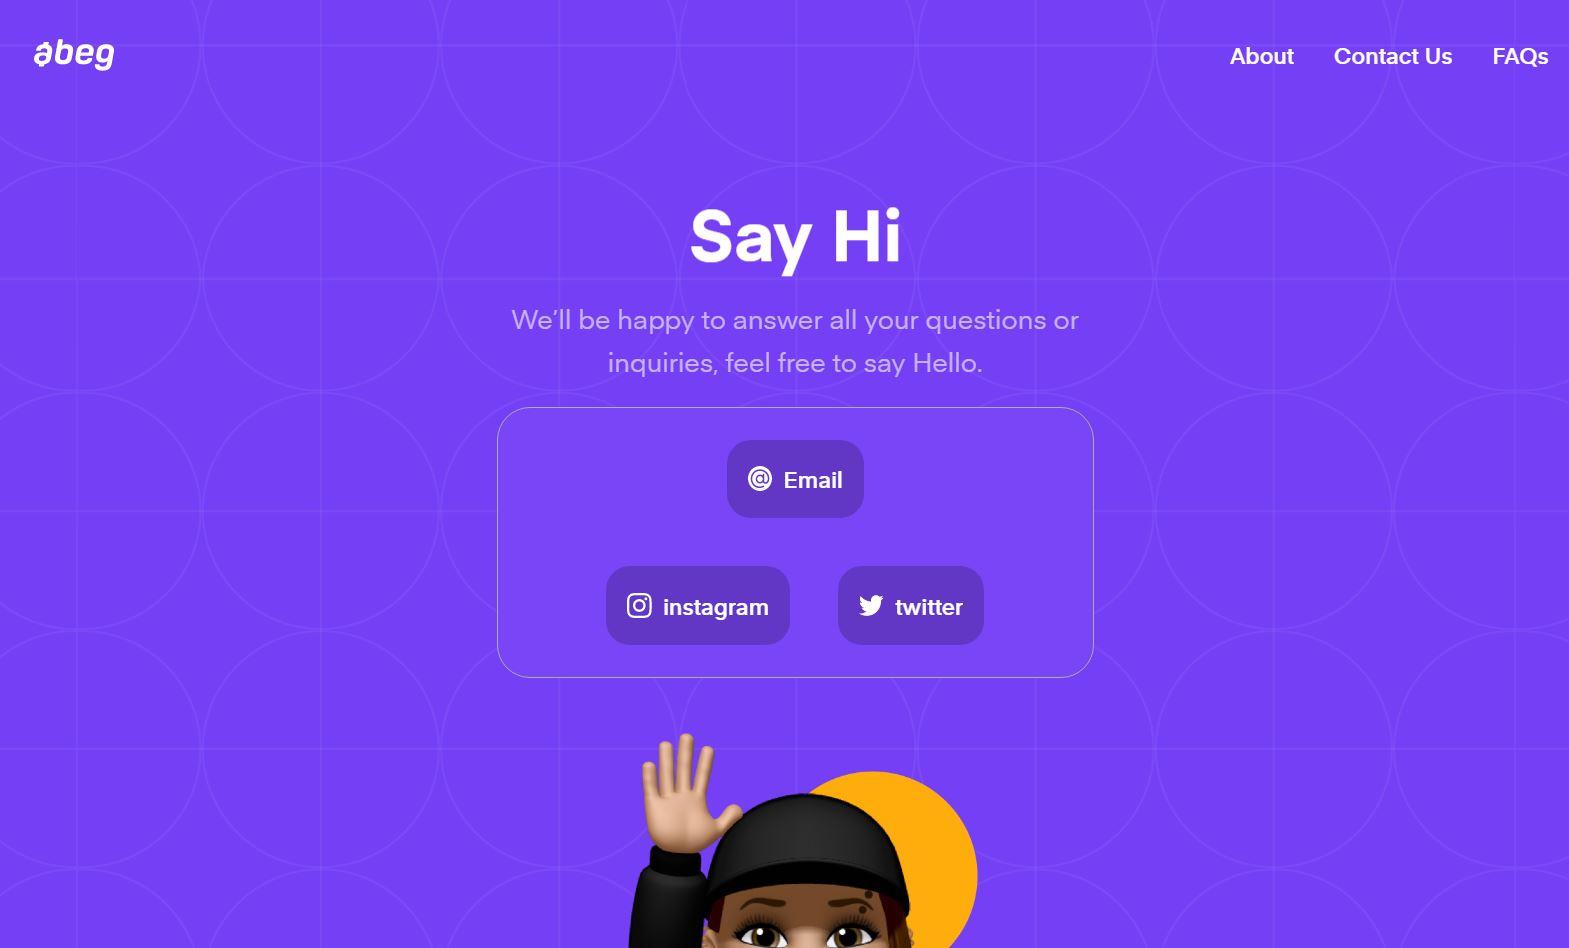 Abeg App Review Customer care